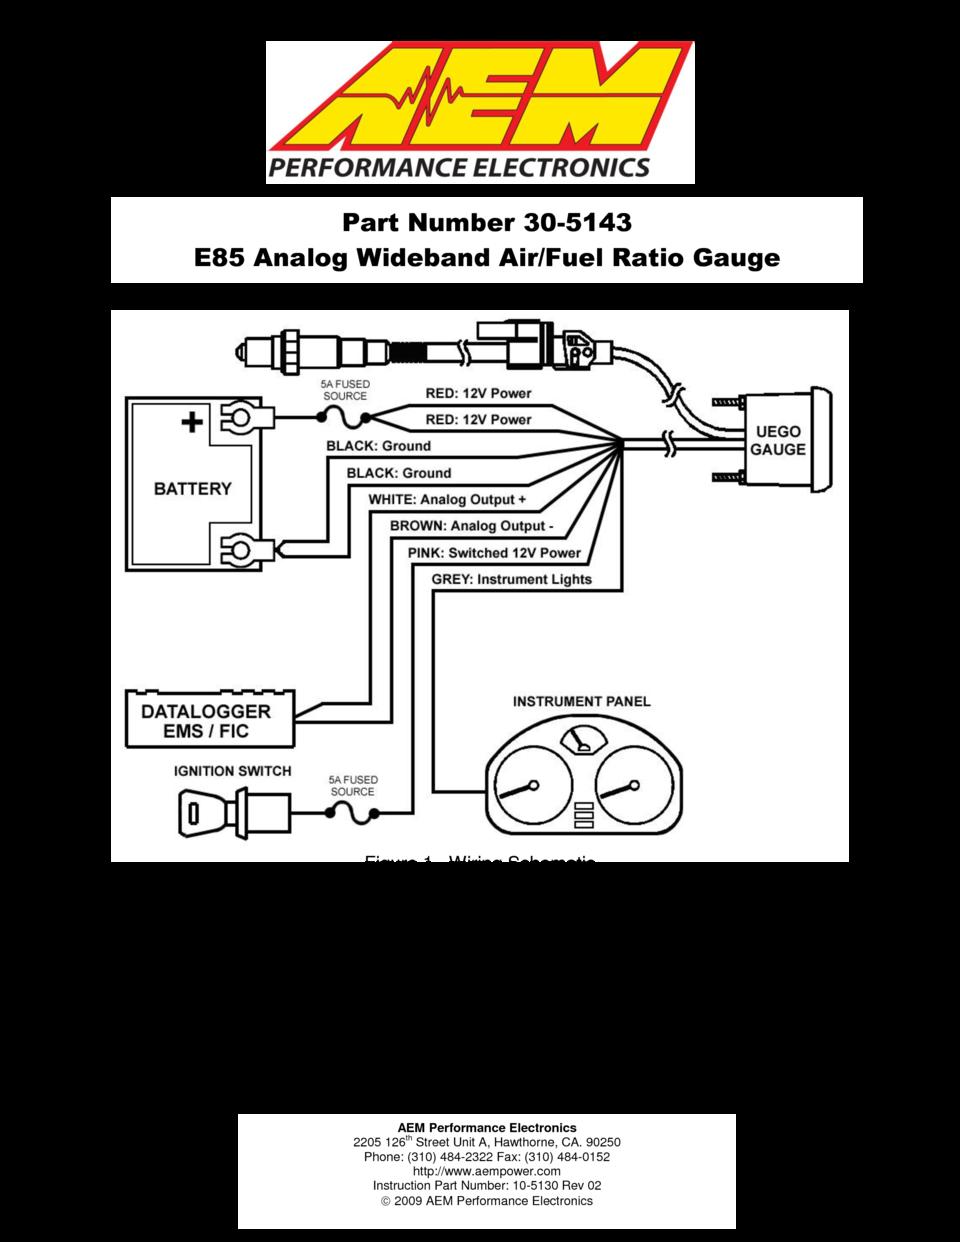 DIAGRAM] Aem Wideband Wiring Diagram FULL Version HD Quality Wiring Diagram  - CIRCUTDIAGRAMS.I-RAS.IT | Aem Wiring Diagram |  | Diagram Database - i-ras.it